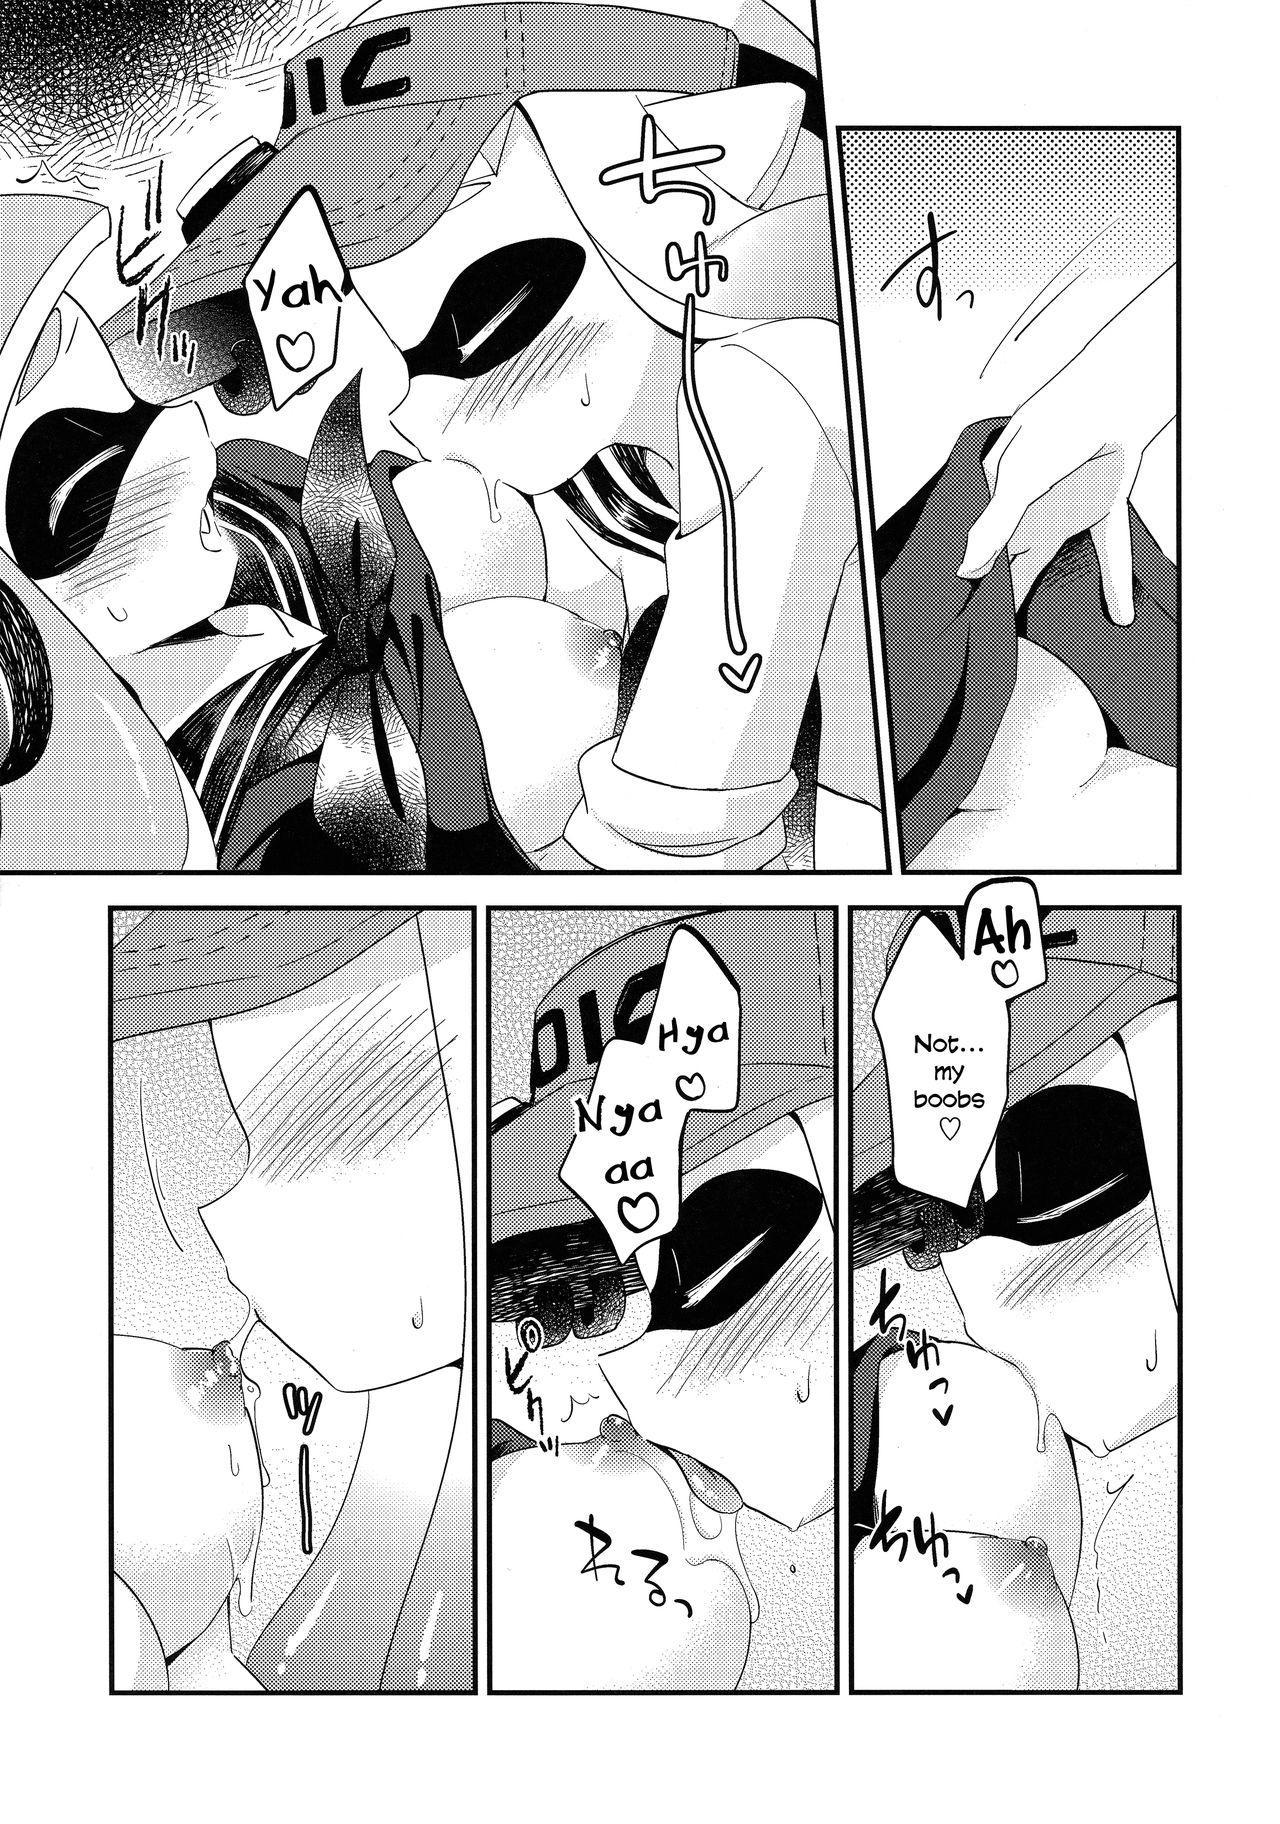 (C90) [Colomonyu (Eromame)] Rezu Geso Gachi♥cchi - Kinoko Takenoko Kassen   Super Lewd Lesbian Calamari - Mushrooms vs Bamboo Shoots (Splatoon) [English] 15